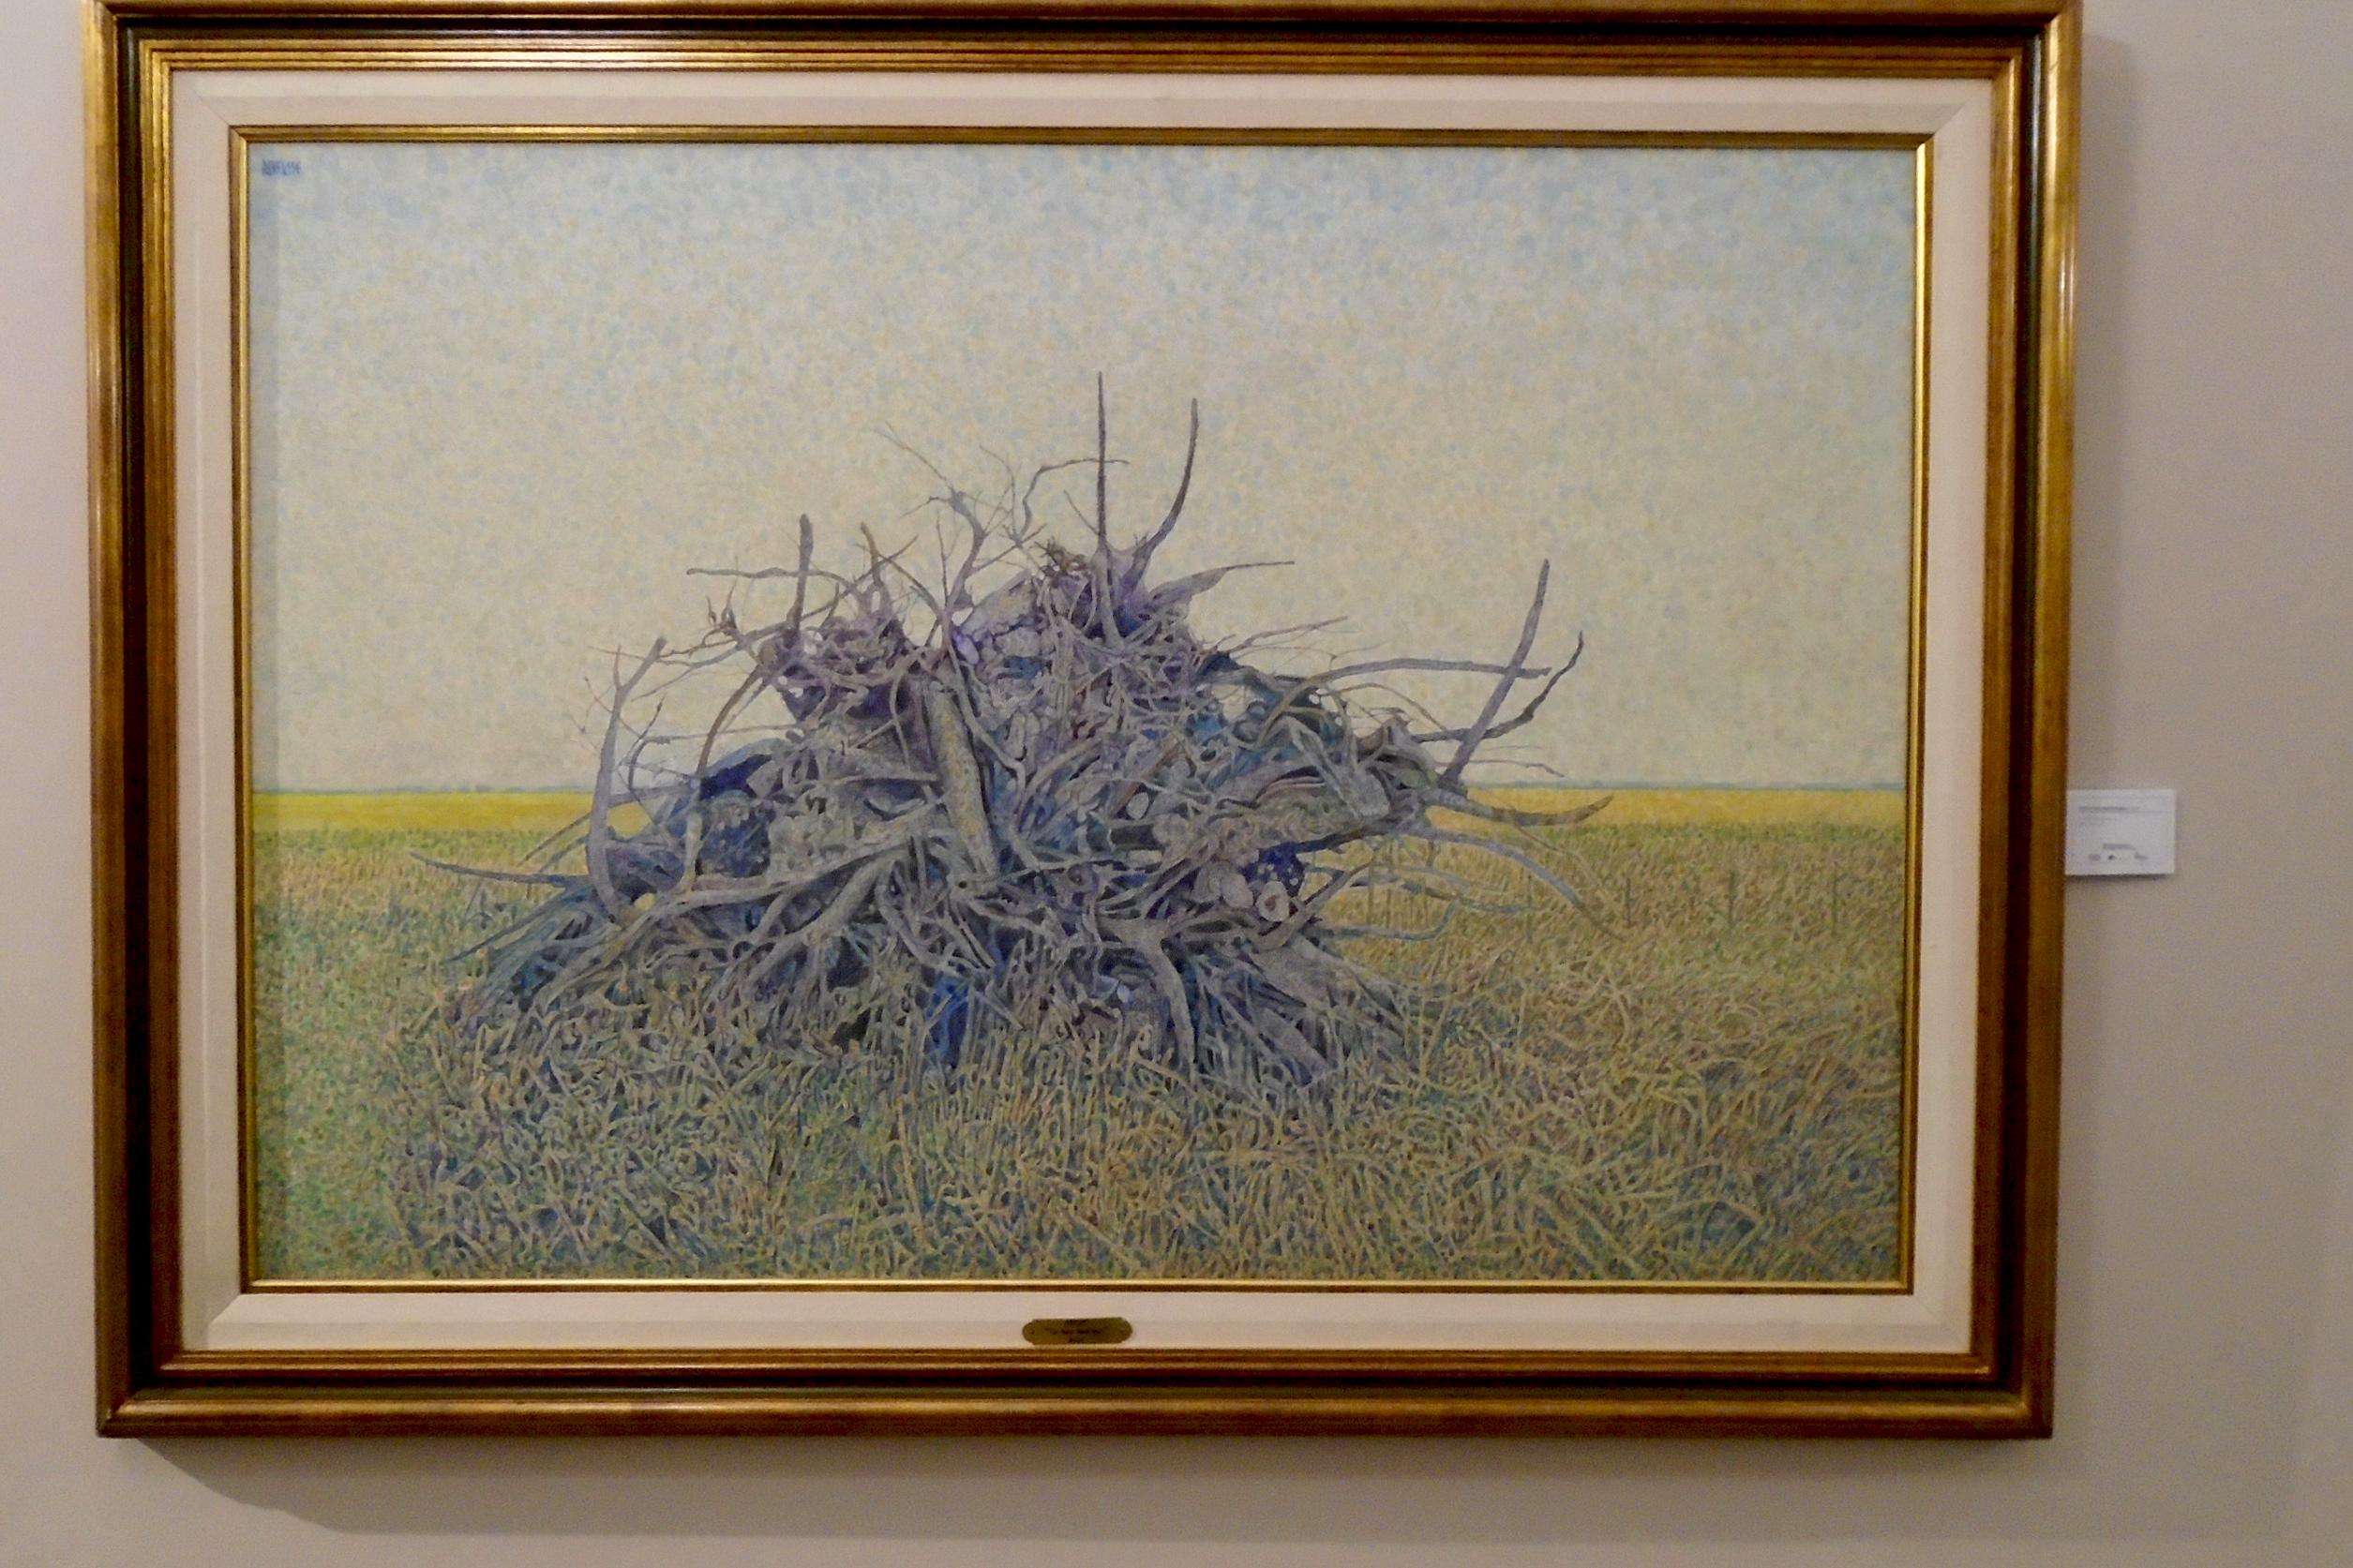 Tus raíces ancestrales, 2004